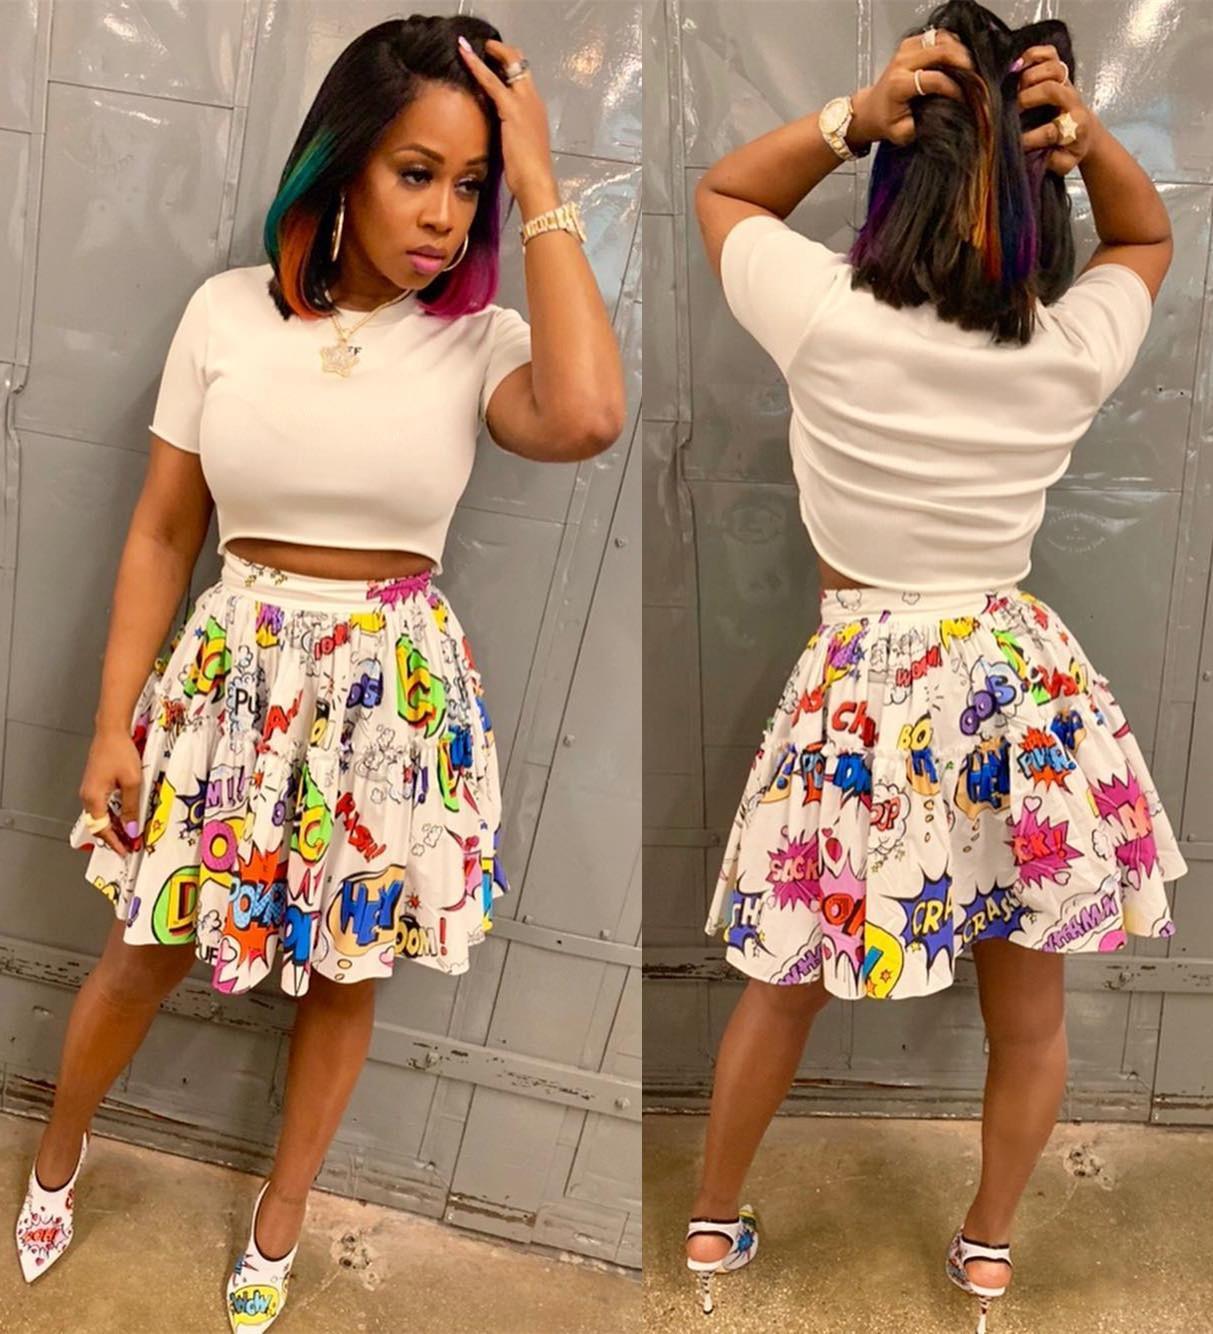 67ca915d252c8c New Summer Dresses Pleated Skirt Blossoming Fashion Cartoon Print Plus Size  Women Clothing Elastic Waist Beach Wear S-XL